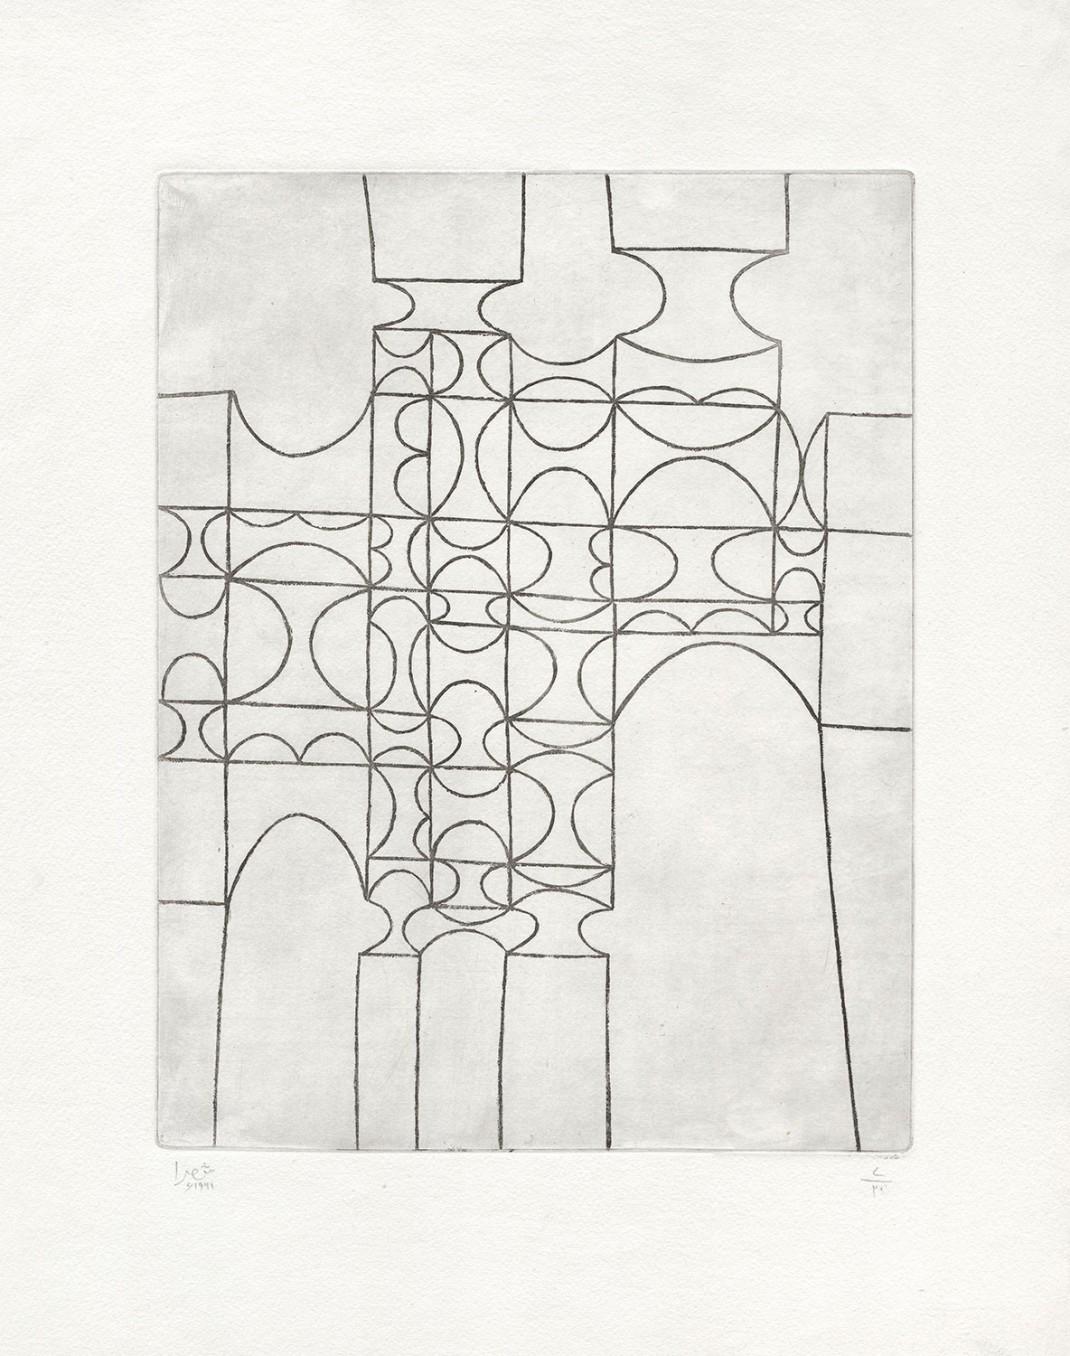 Anwar Jalal Shemza, City Gate, 1961, Aquatint, 56.5 x 43.8 cm, 22 1/4 x 17 1/4 in,  Framed: 62.2 x 51.6 cm, 24 1/2 x 20 3/8 in